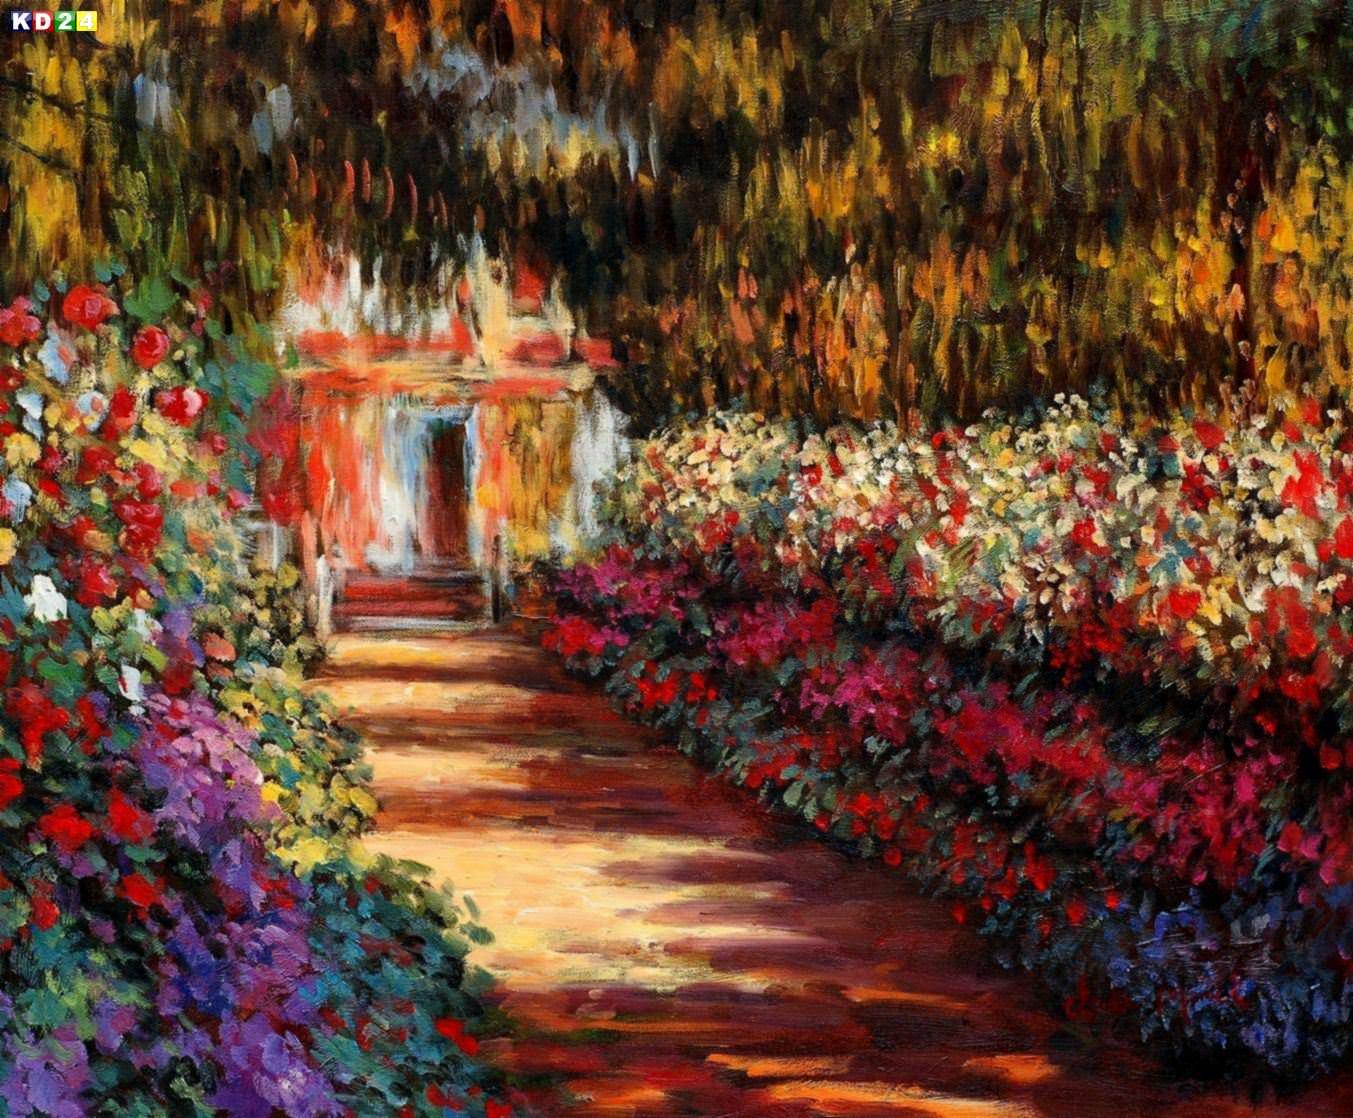 Blumengarten Bilder claude monet blumengarten in giverny c82934 50x60cm ölbild handgemalt ebay